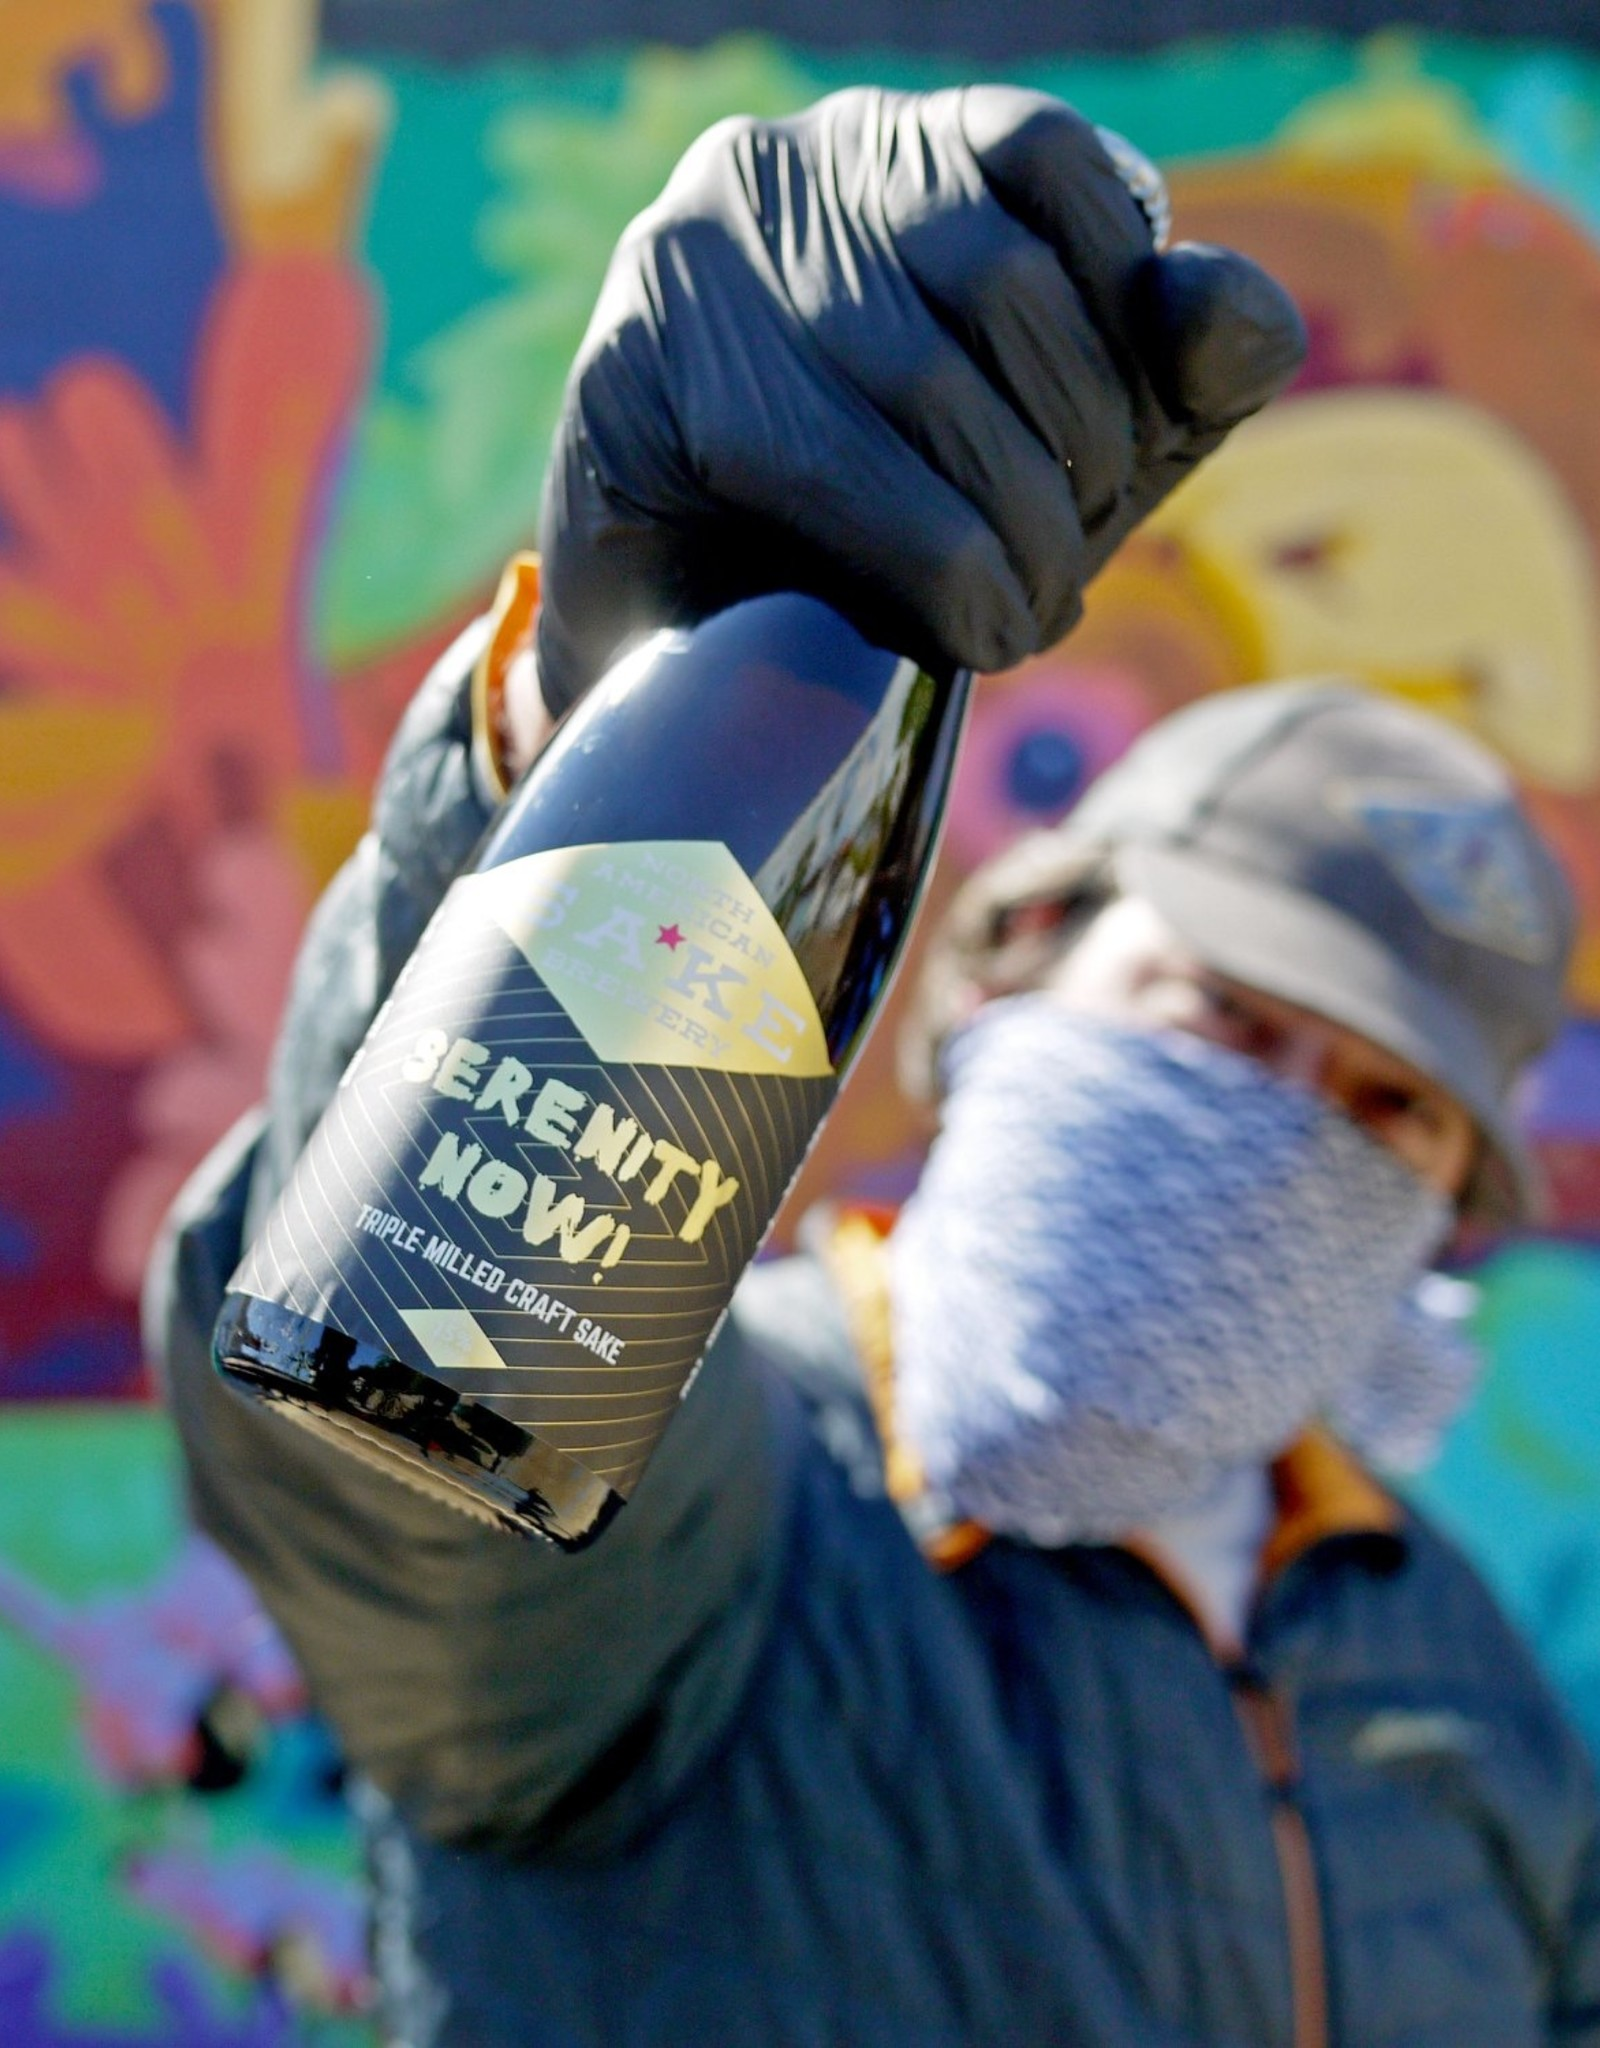 North American Sake Brewery North American Sake Brewery Serenity Now! Sake 375ml